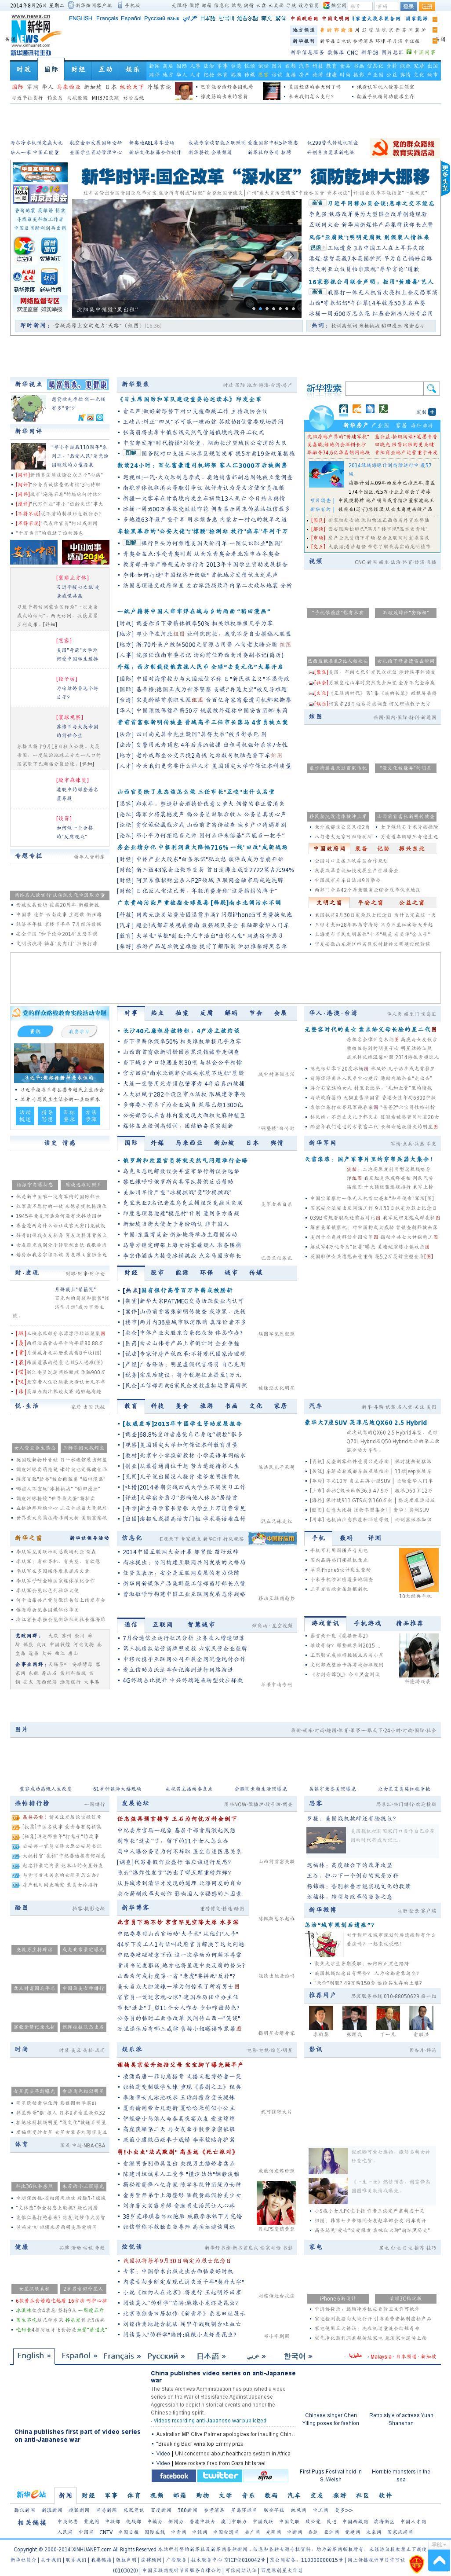 Xinhua at Tuesday Aug. 26, 2014, 10:19 a.m. UTC